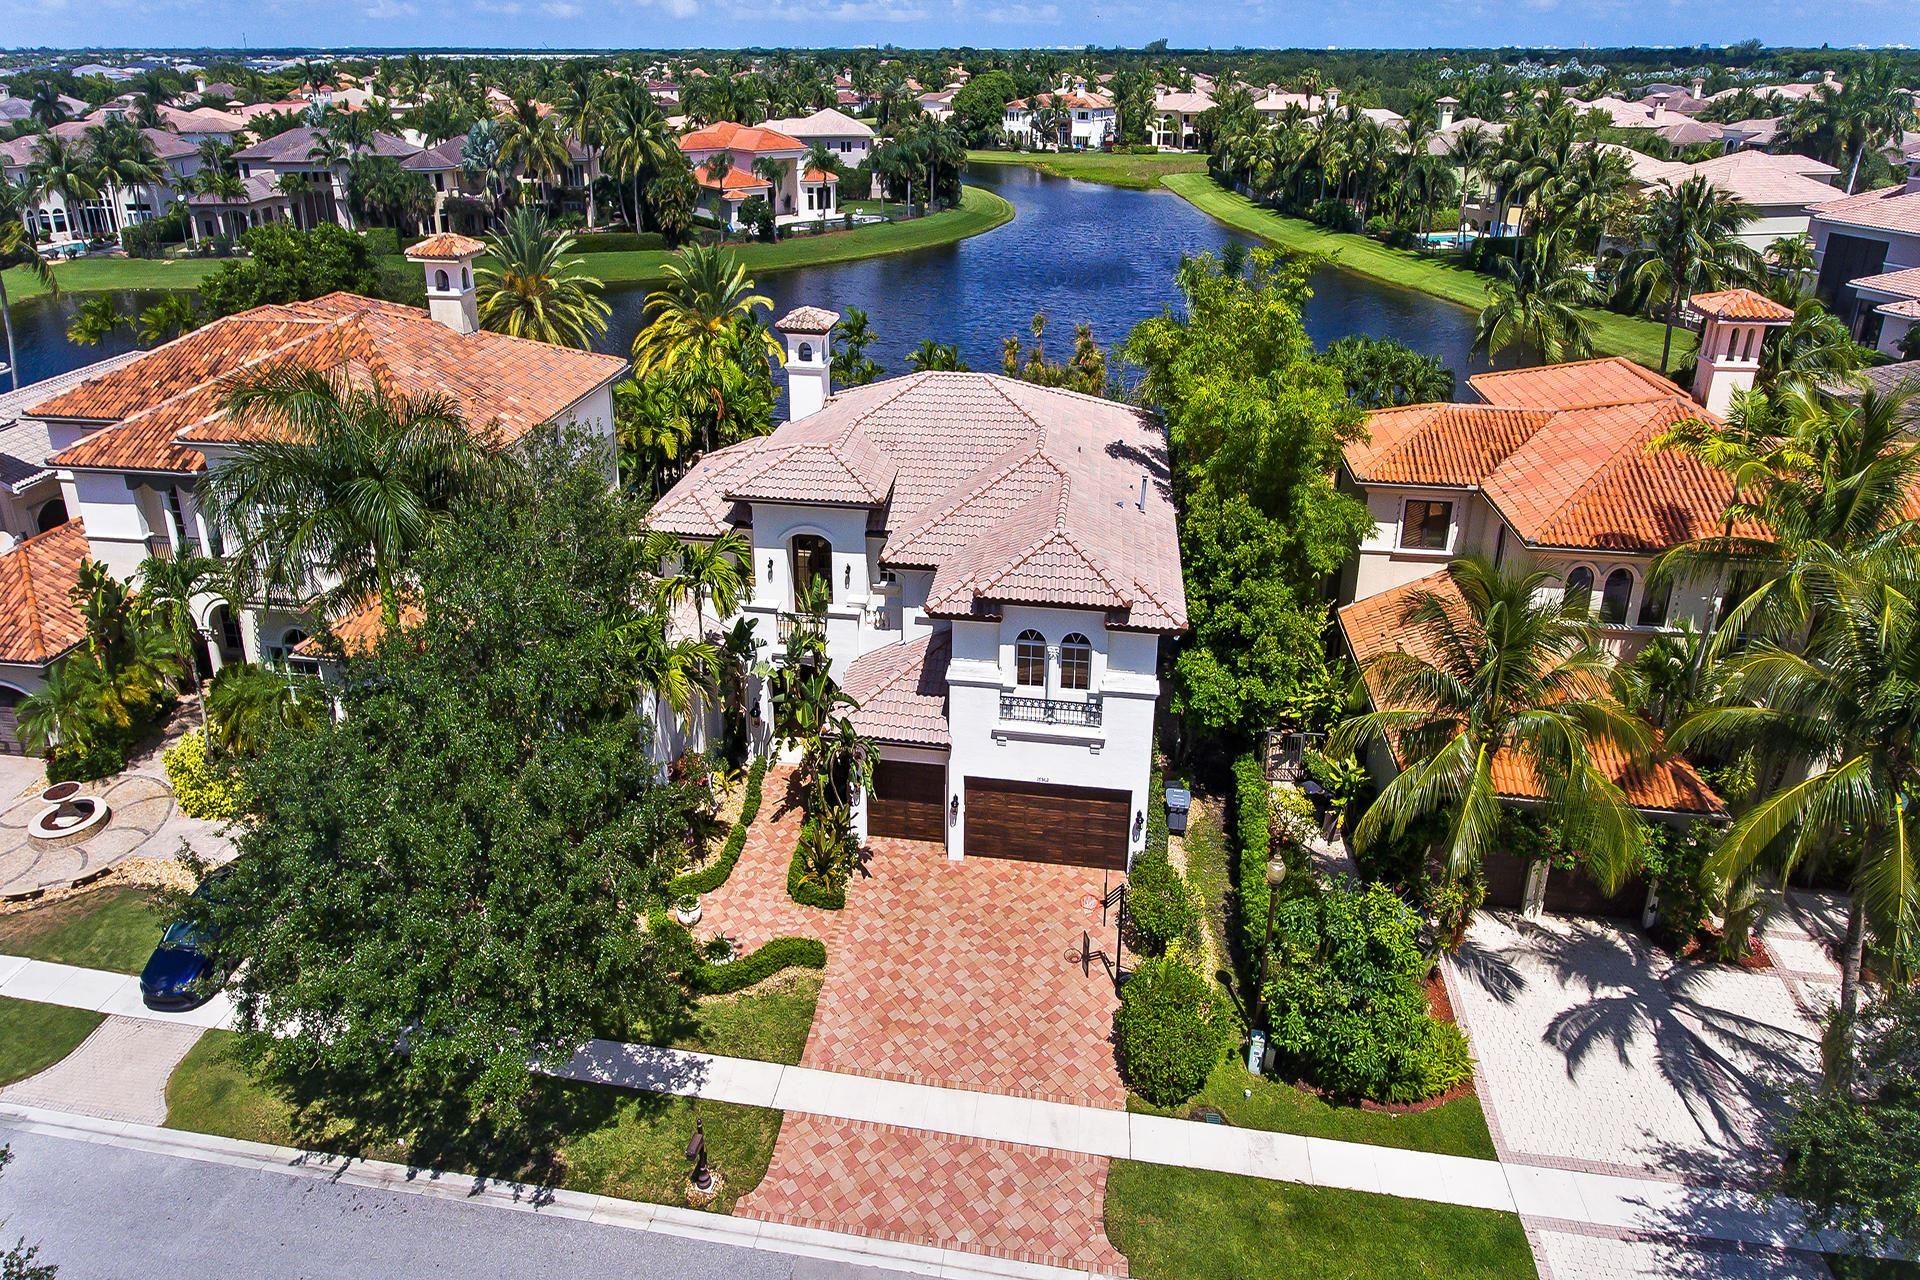 17562 Middlebrook Way, Boca Raton, FL 33496 - #: RX-10627387